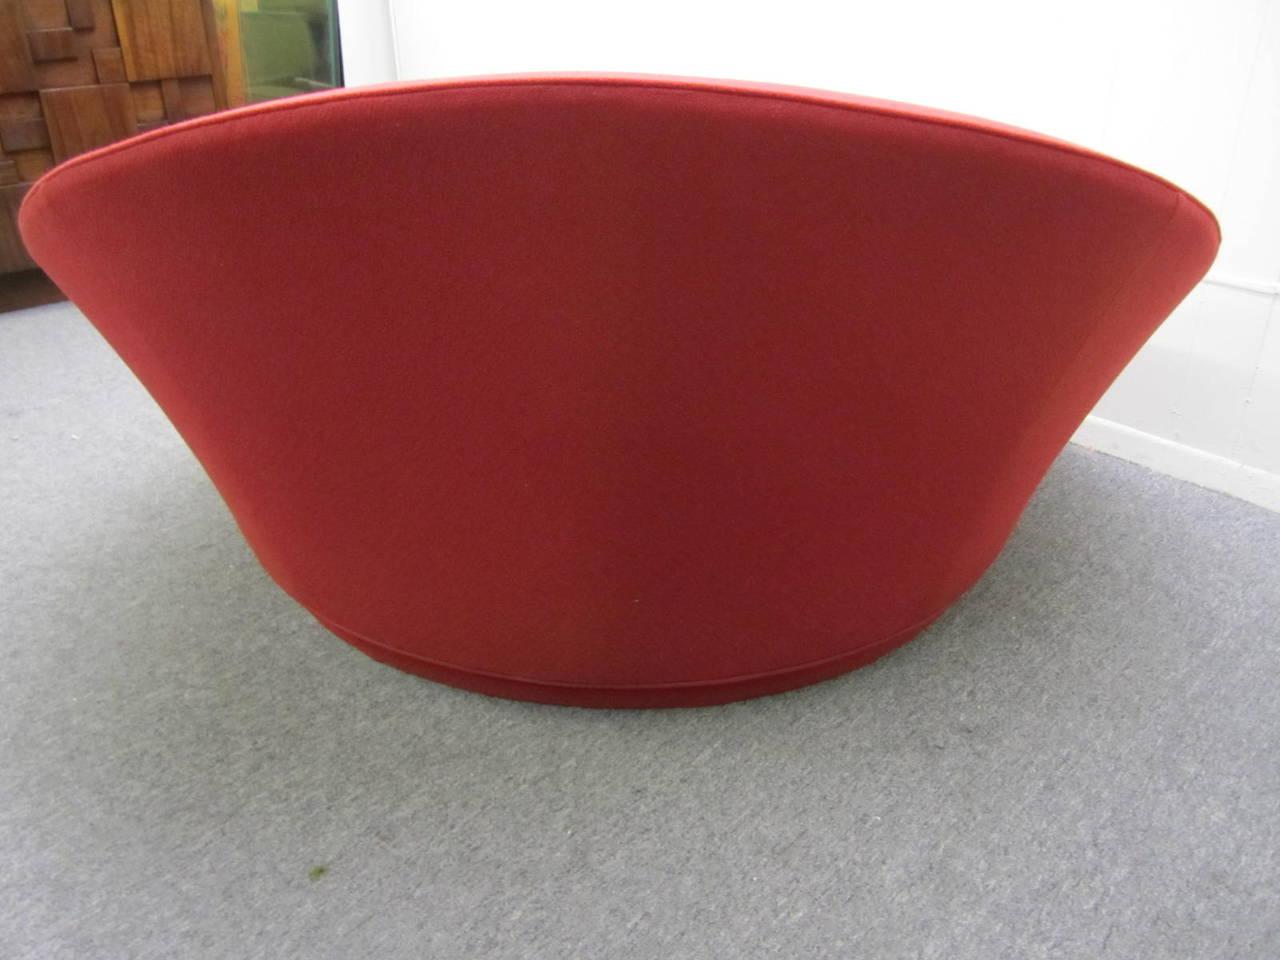 Fabulous Circular Round Lounge Chair by Milo Baughman Mid Century Modern at